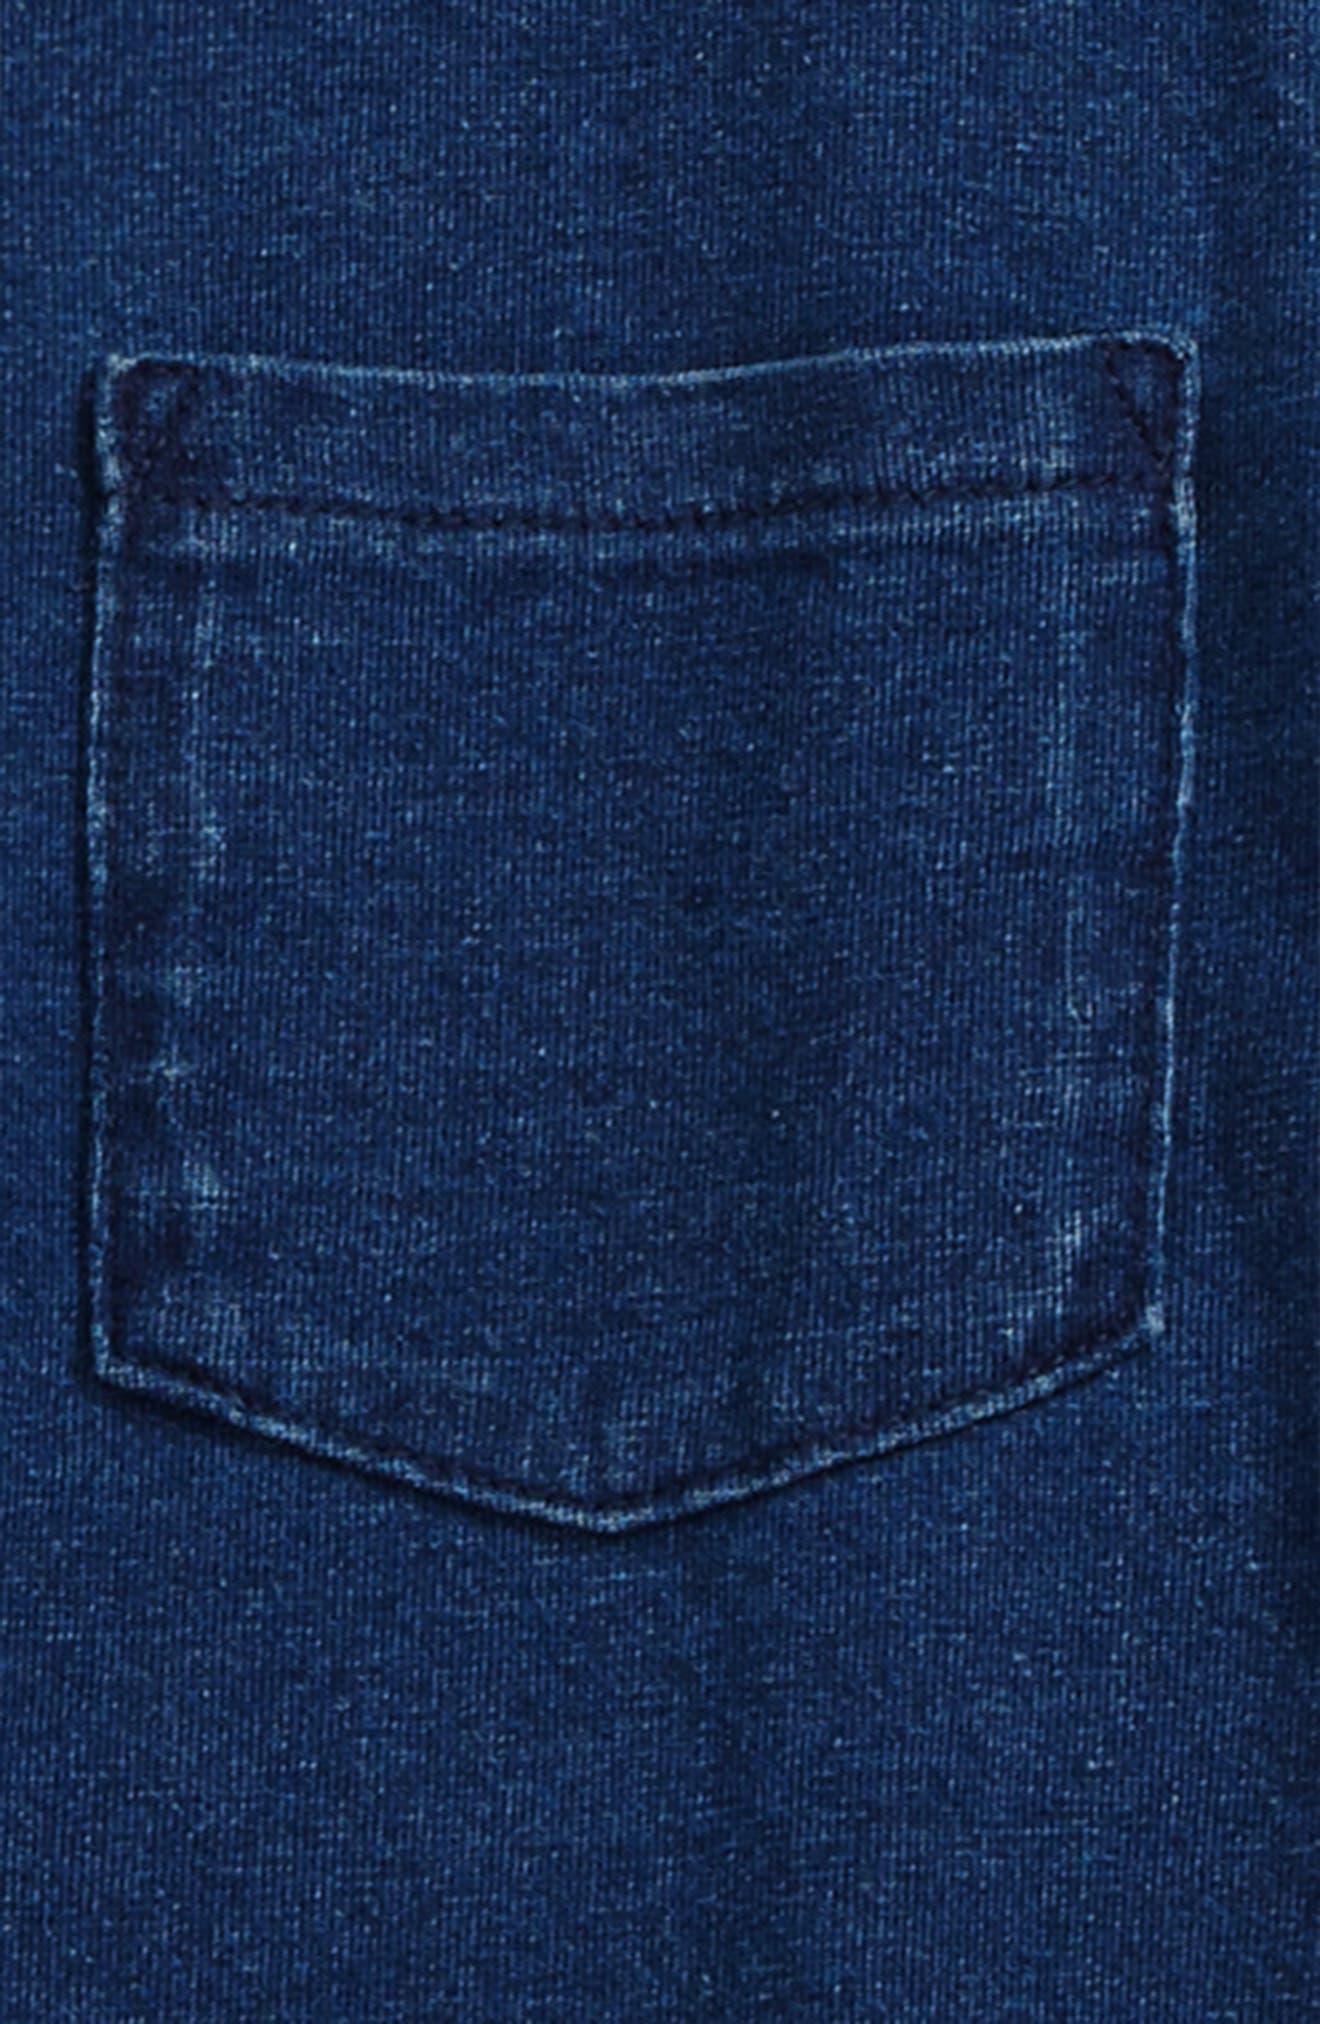 AG Henley T-Shirt,                             Alternate thumbnail 2, color,                             Indigo Rinse